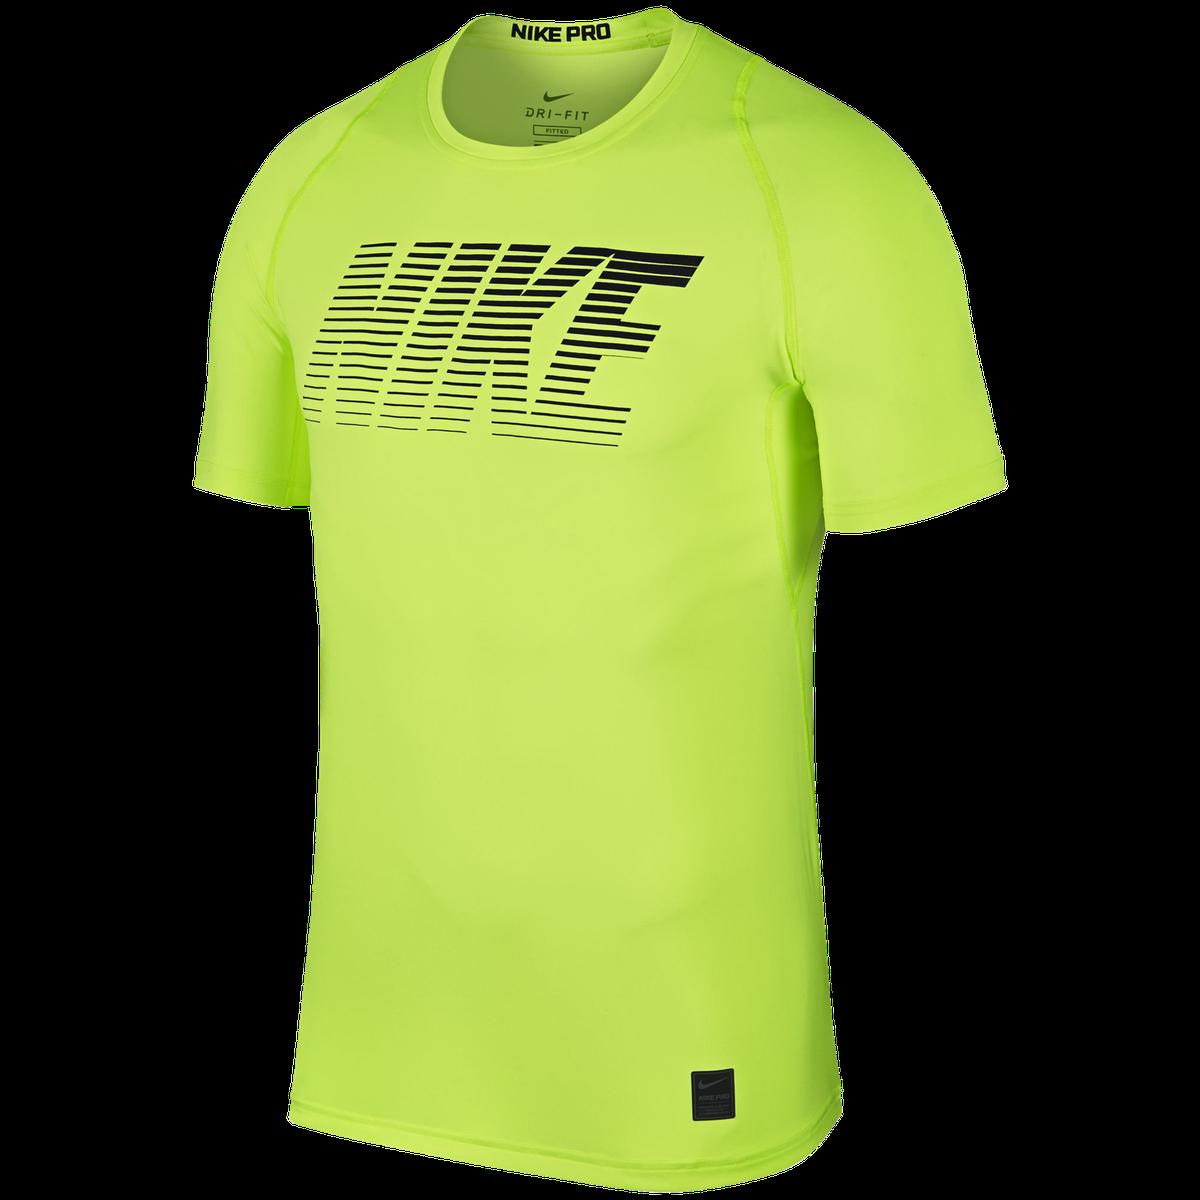 the best attitude bf4df 138f4 Nike Pro Short Sleeve Fitted Tee, t-shirt herr - Gul - Tränings t-shirts  Herr   XXL